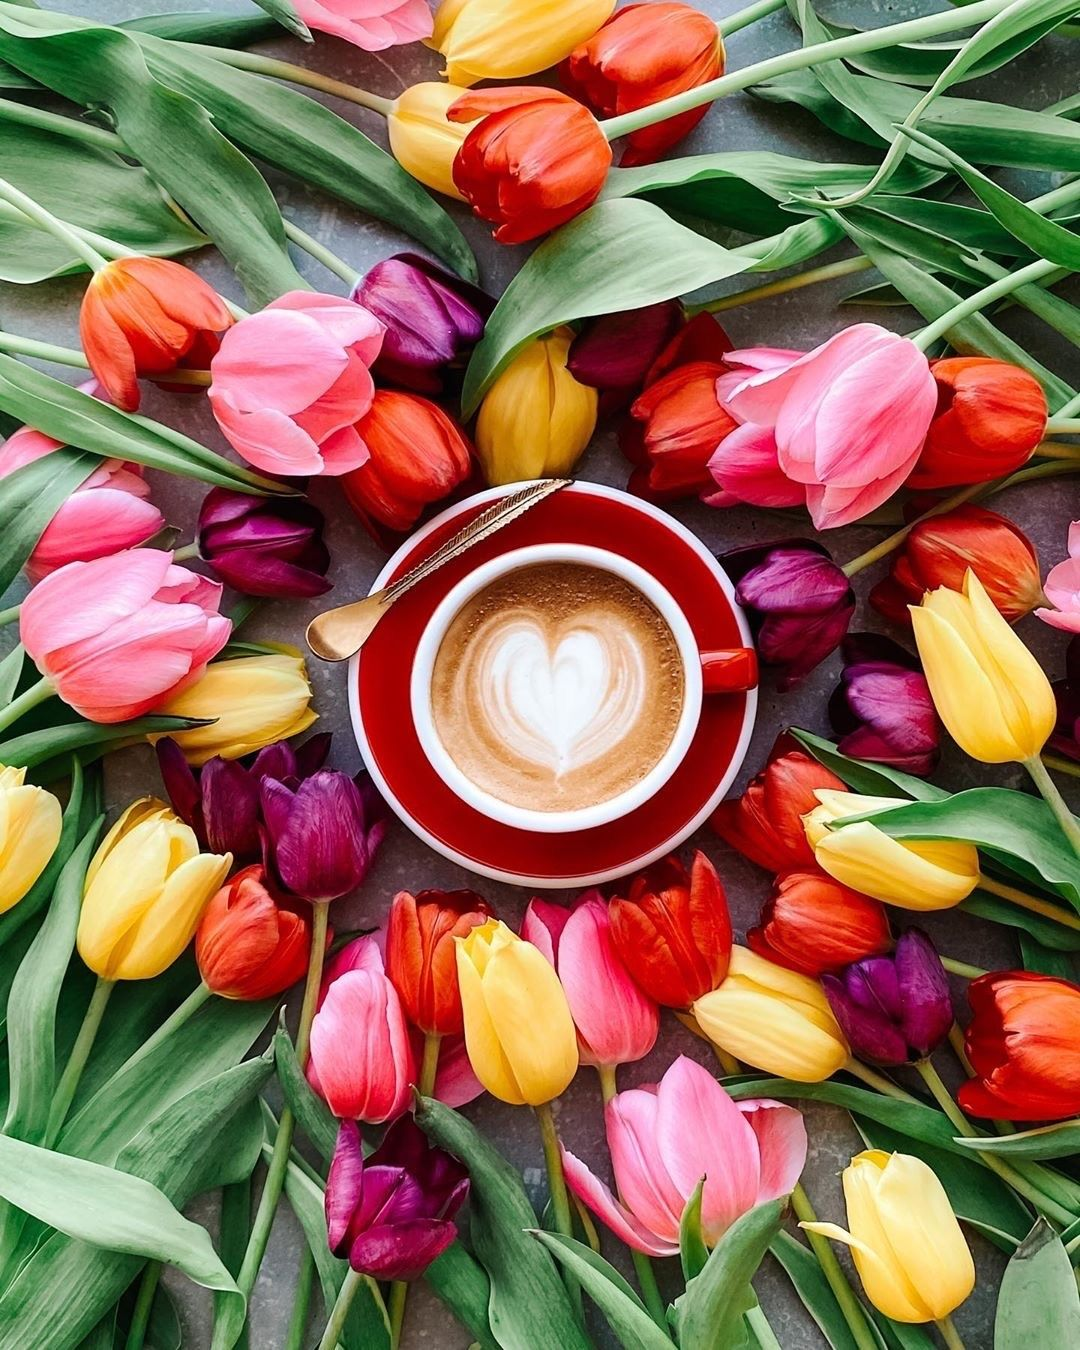 fleur aesthetic in 2020 Friday coffee, Instagram, But